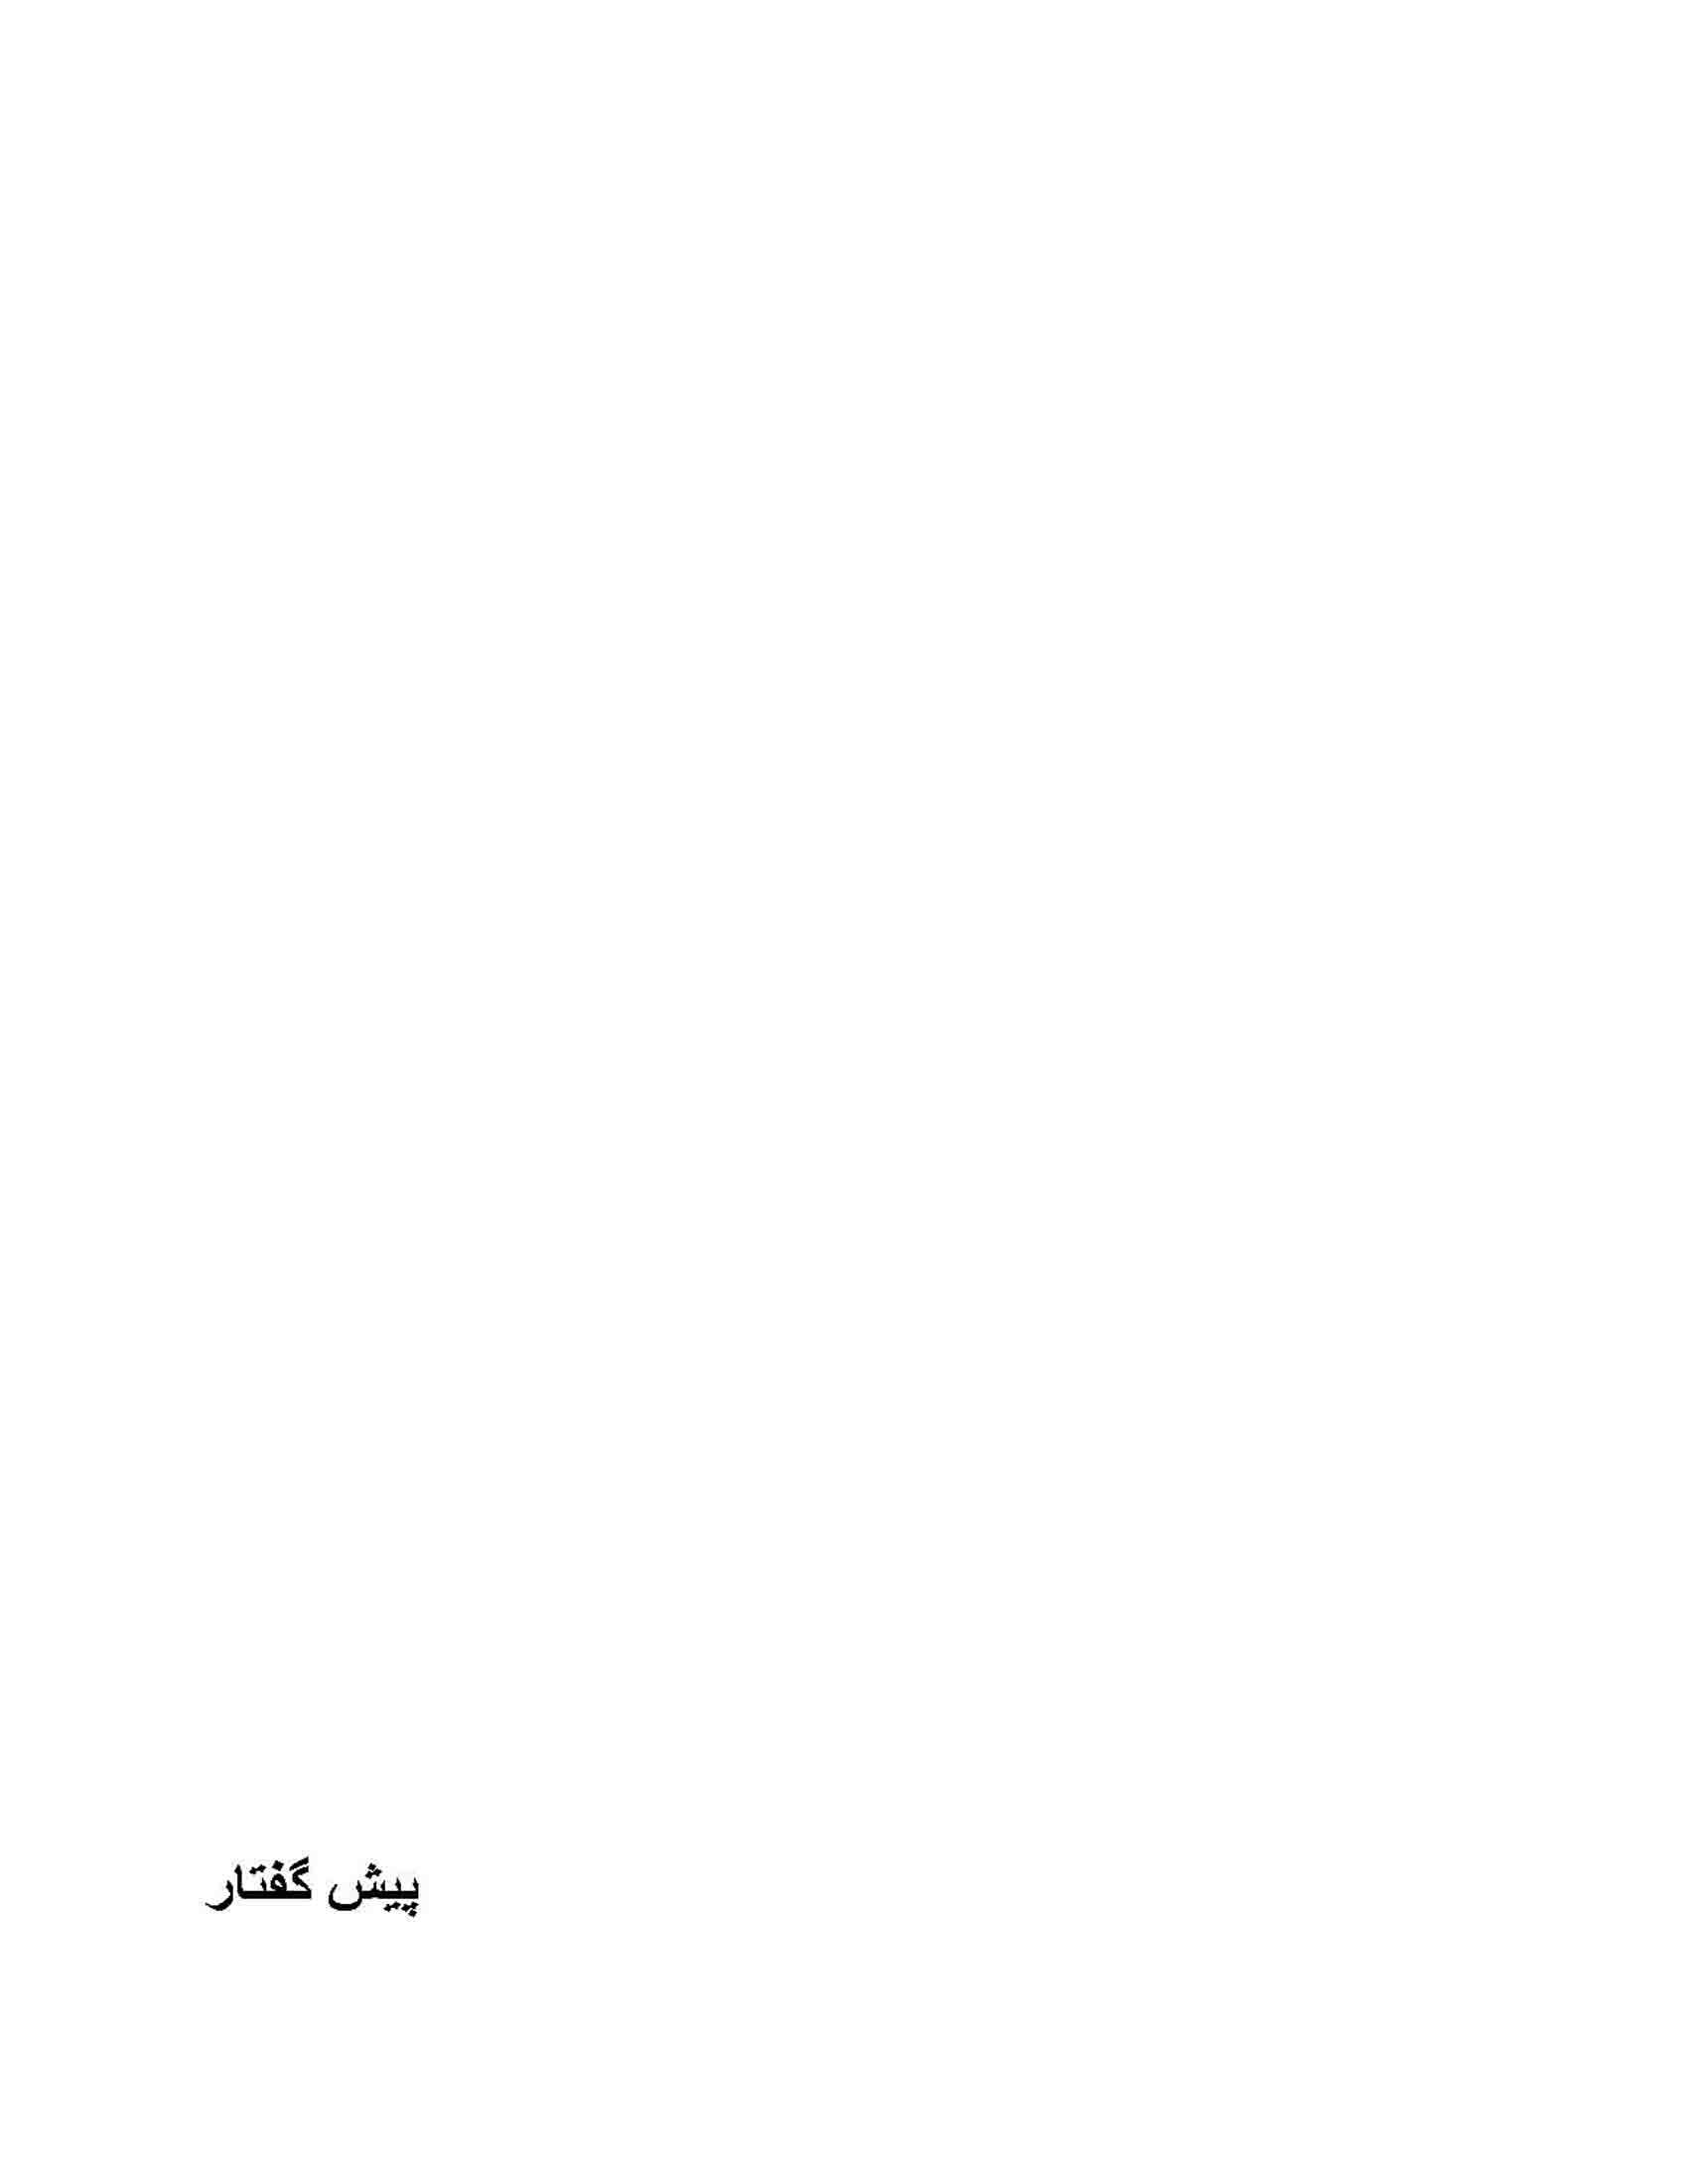 goriz_sample_page_03